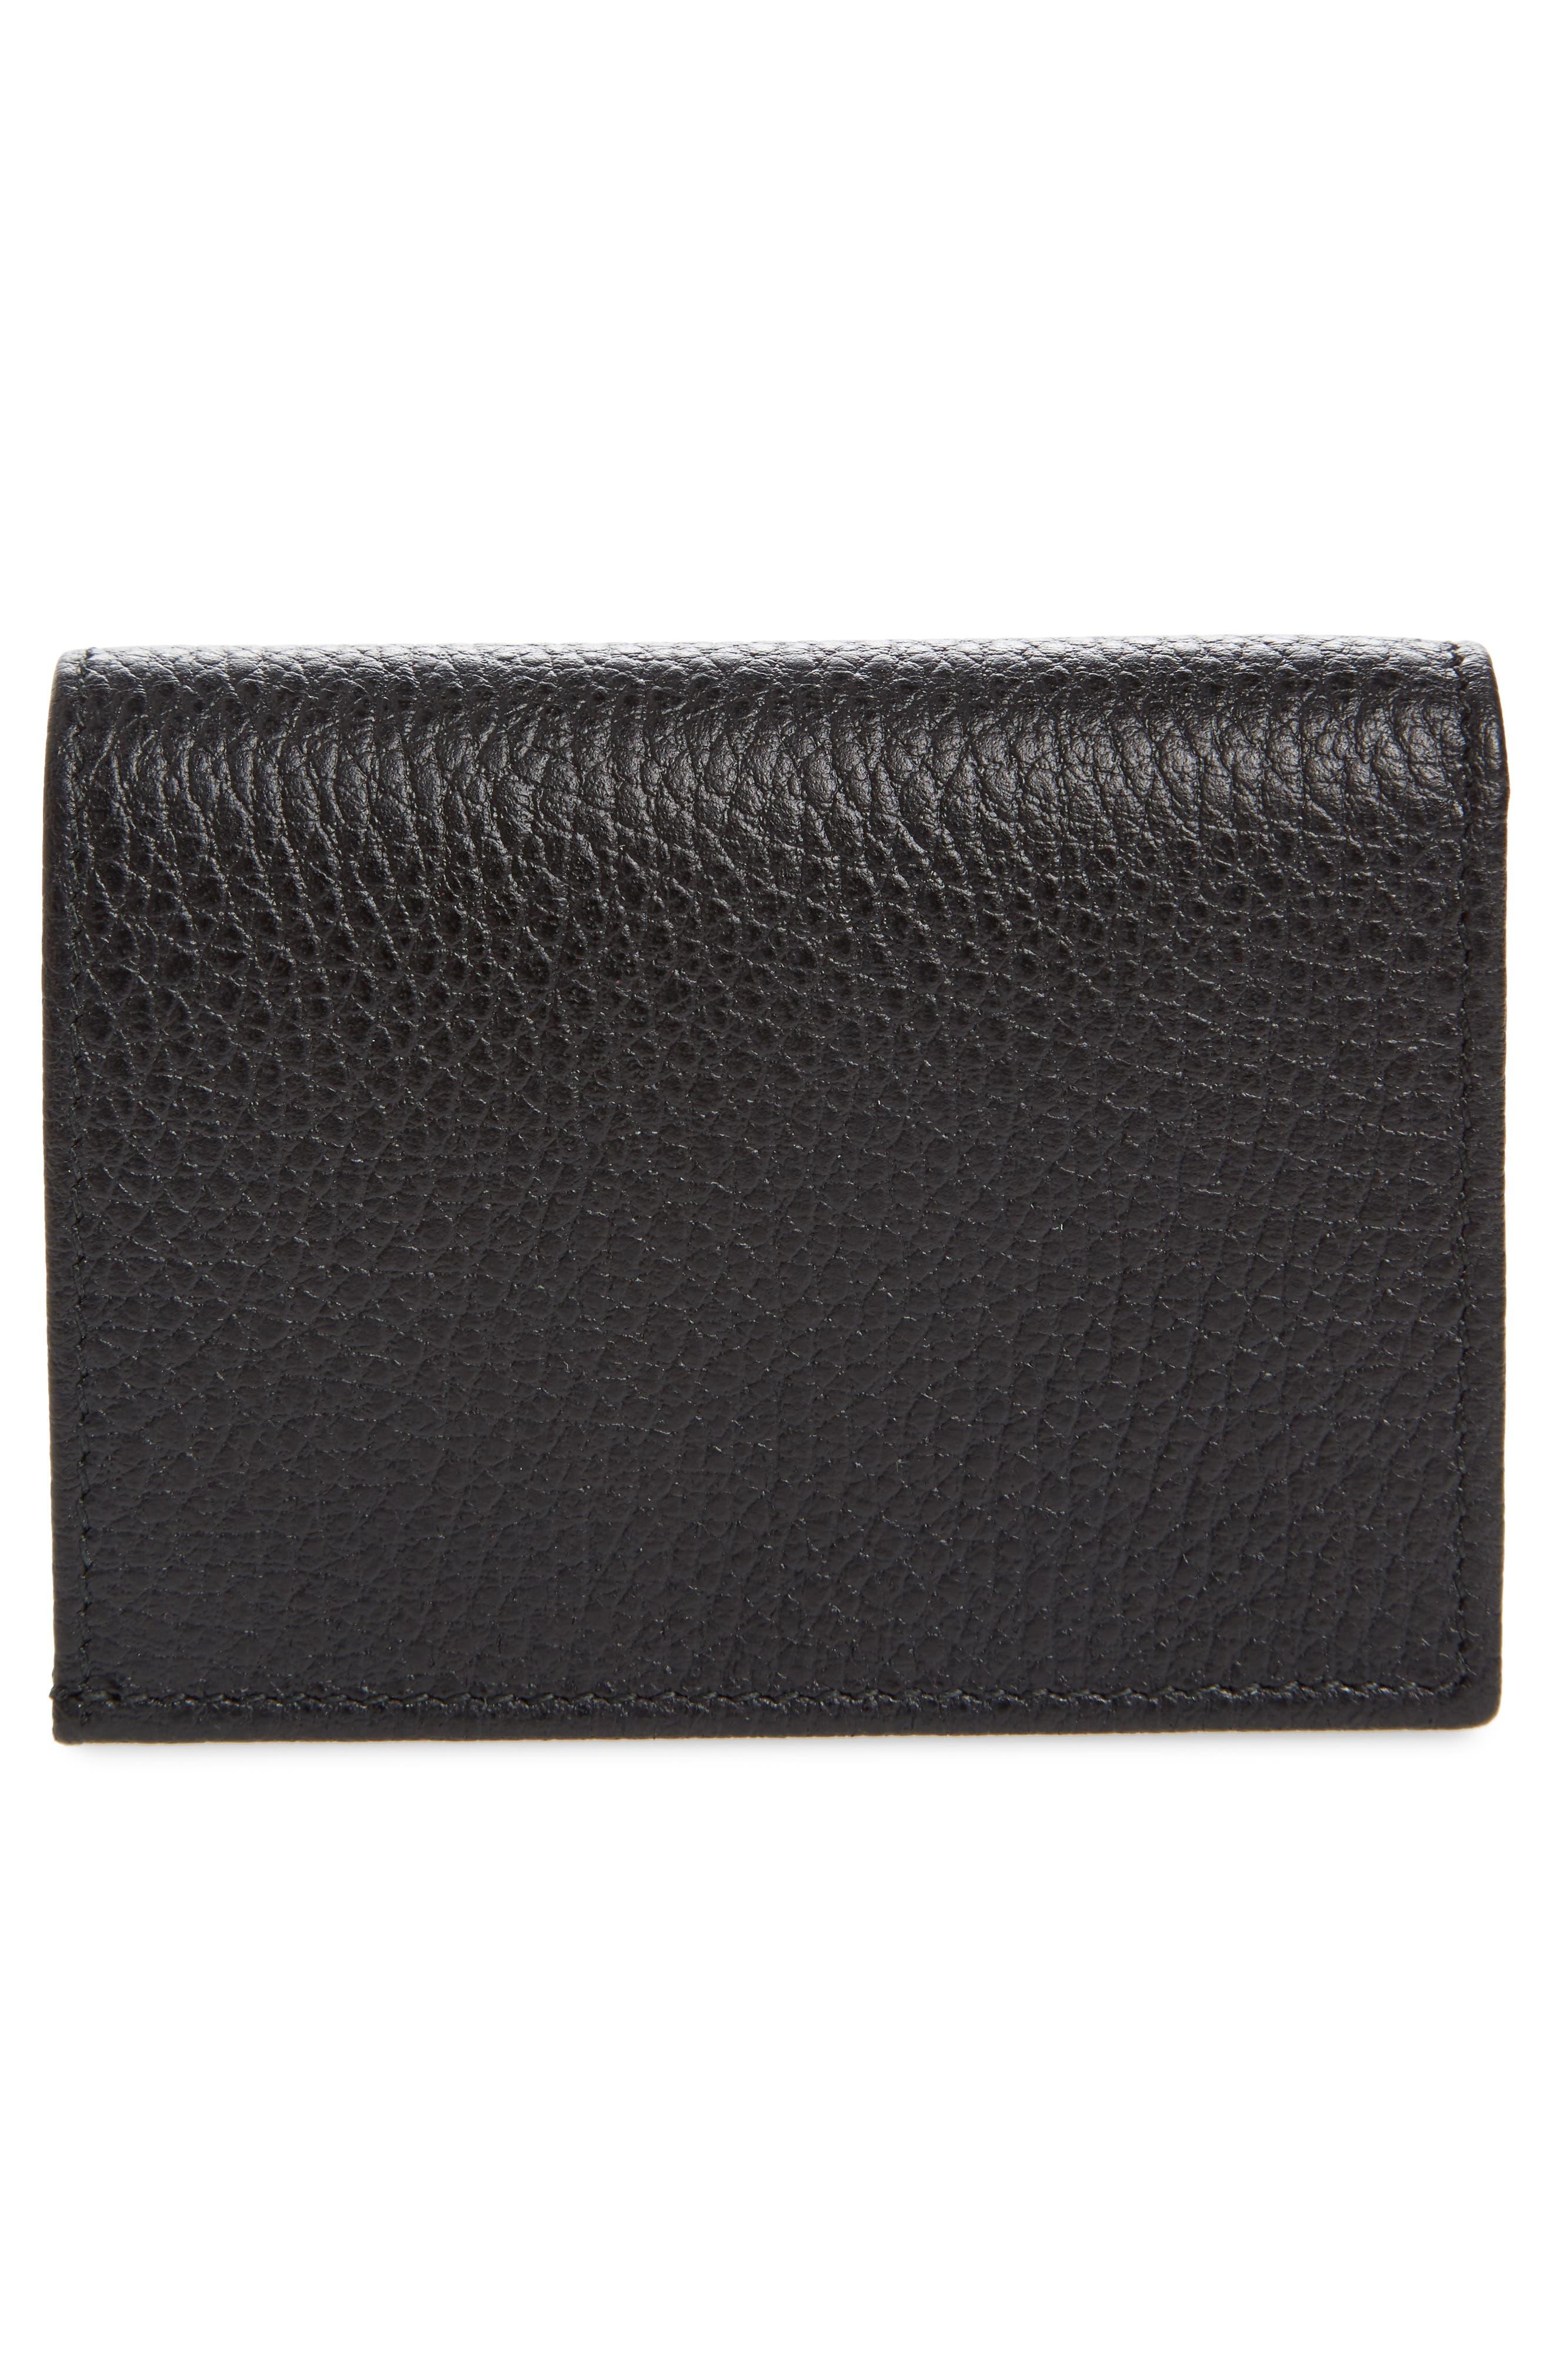 Petite Marmont Leather Card Case,                             Alternate thumbnail 3, color,                             Nero/ Nero